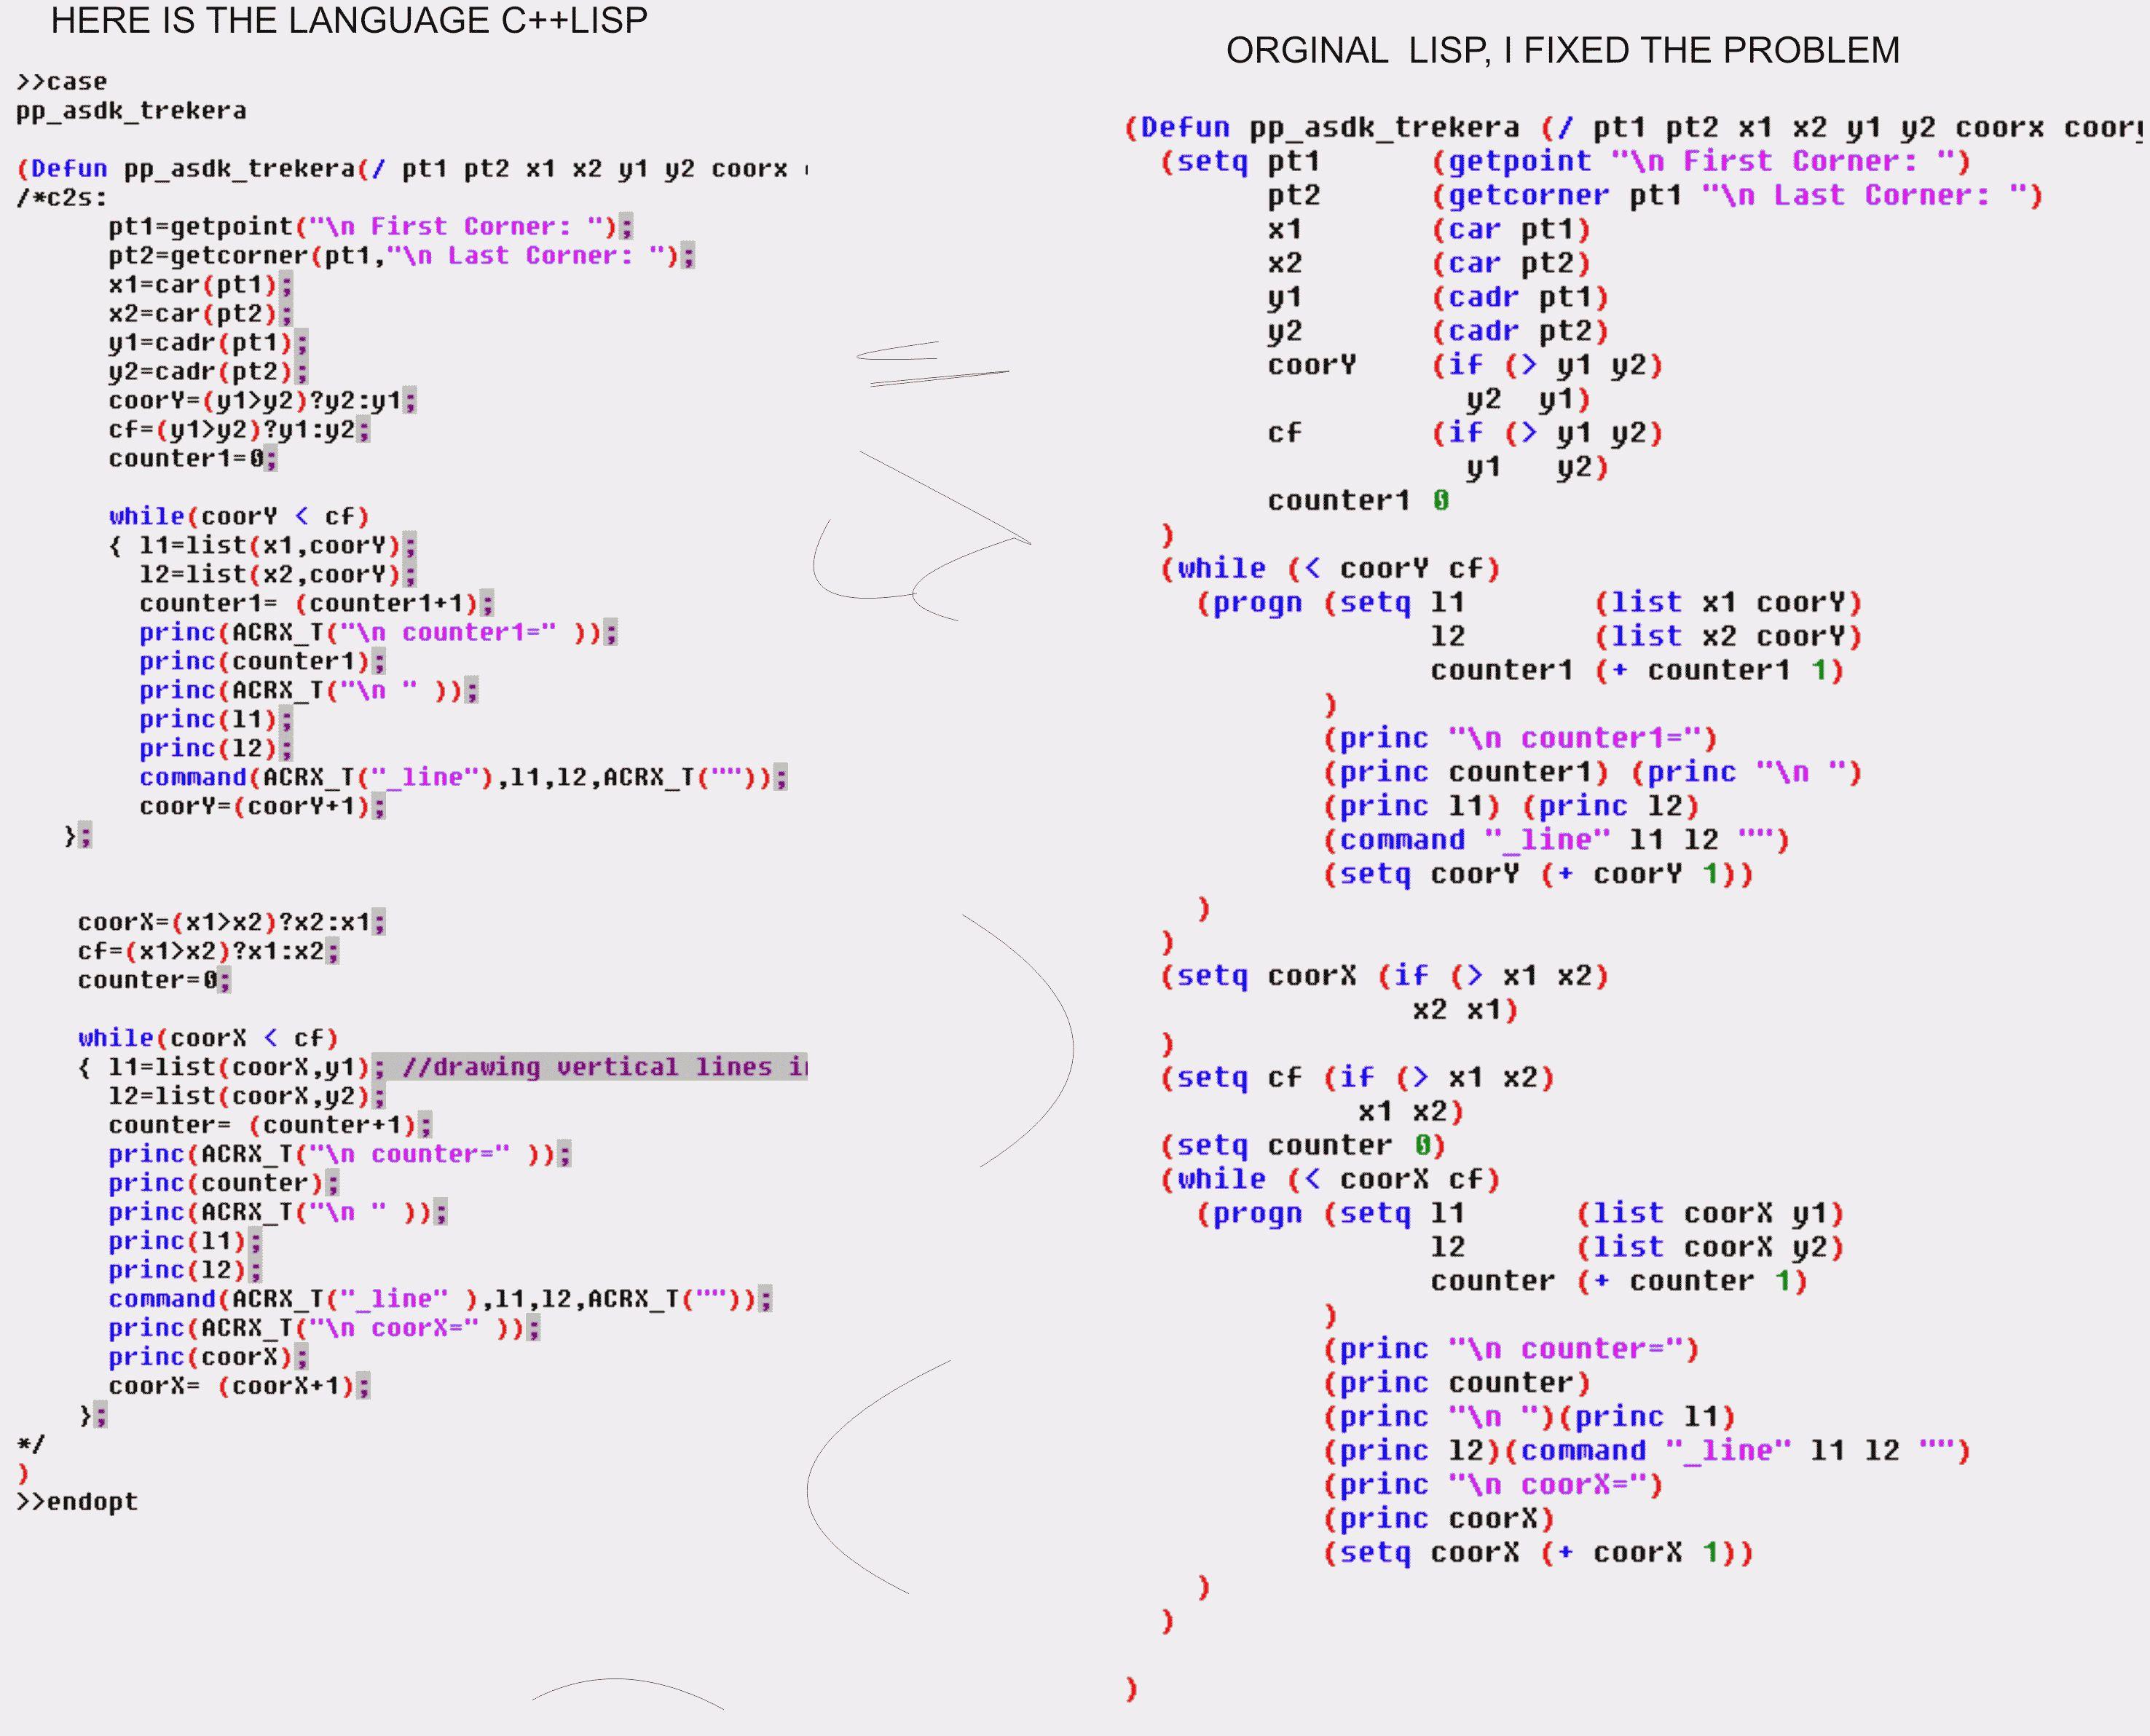 lisp programming - Monza berglauf-verband com